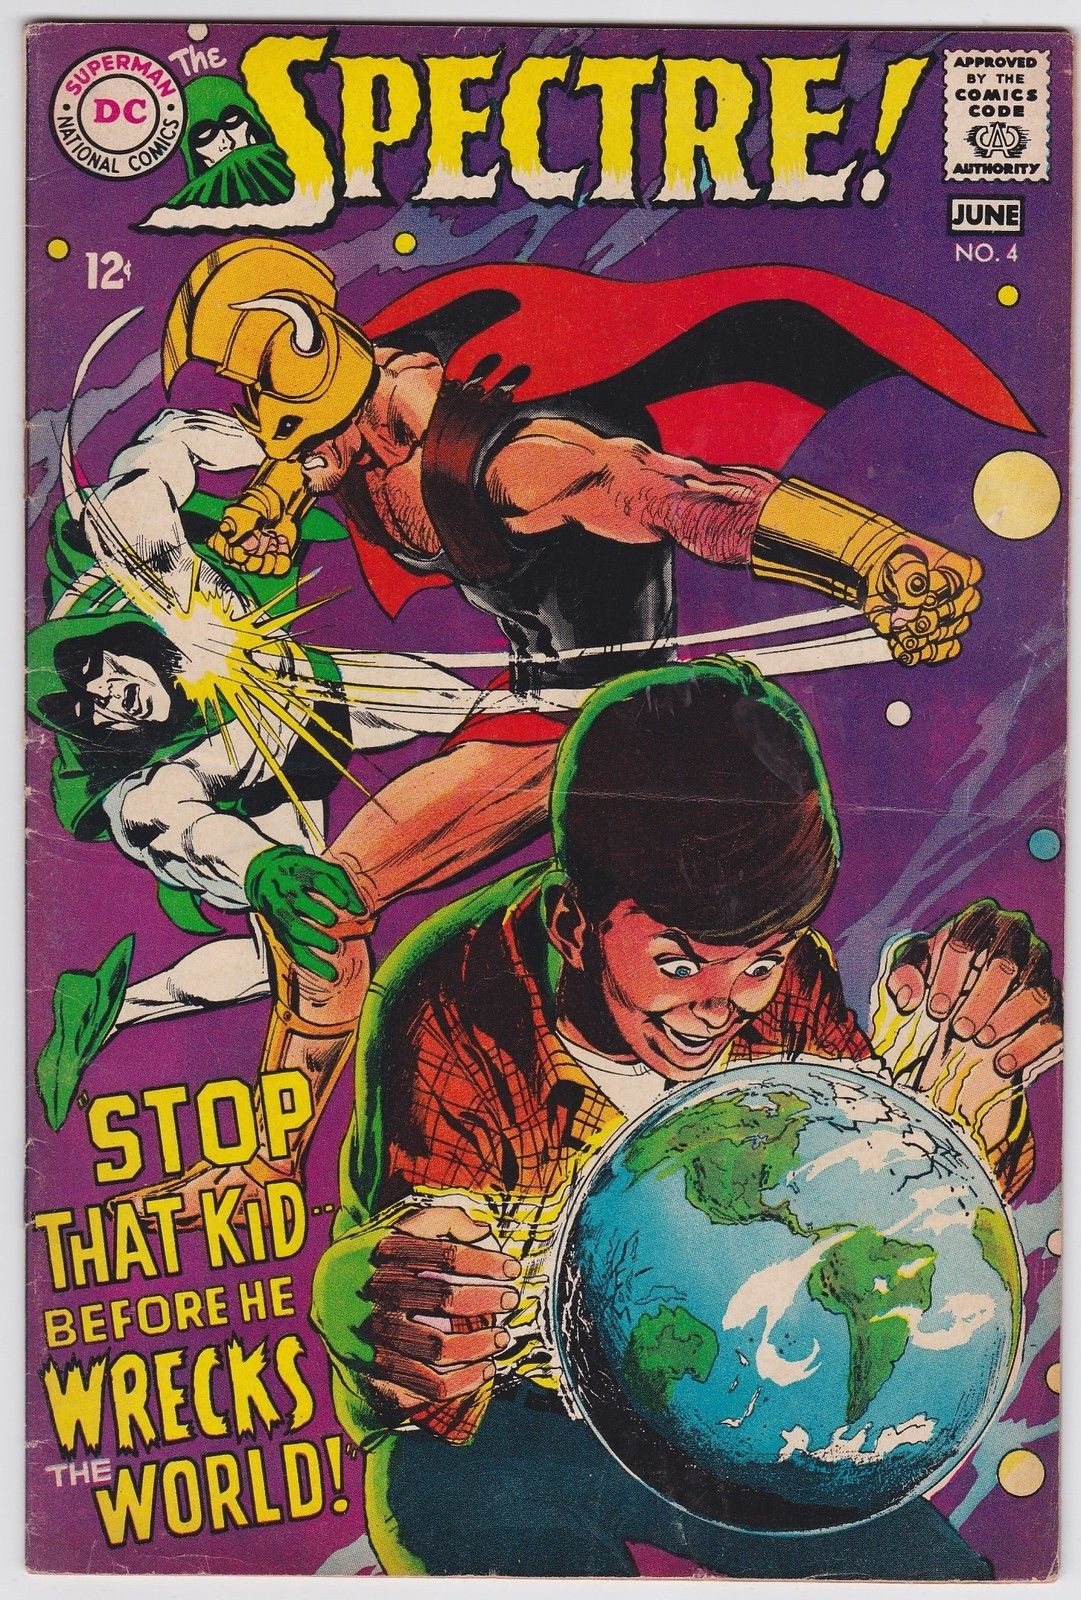 Comics Illustrator Of The Week: Neal Adams